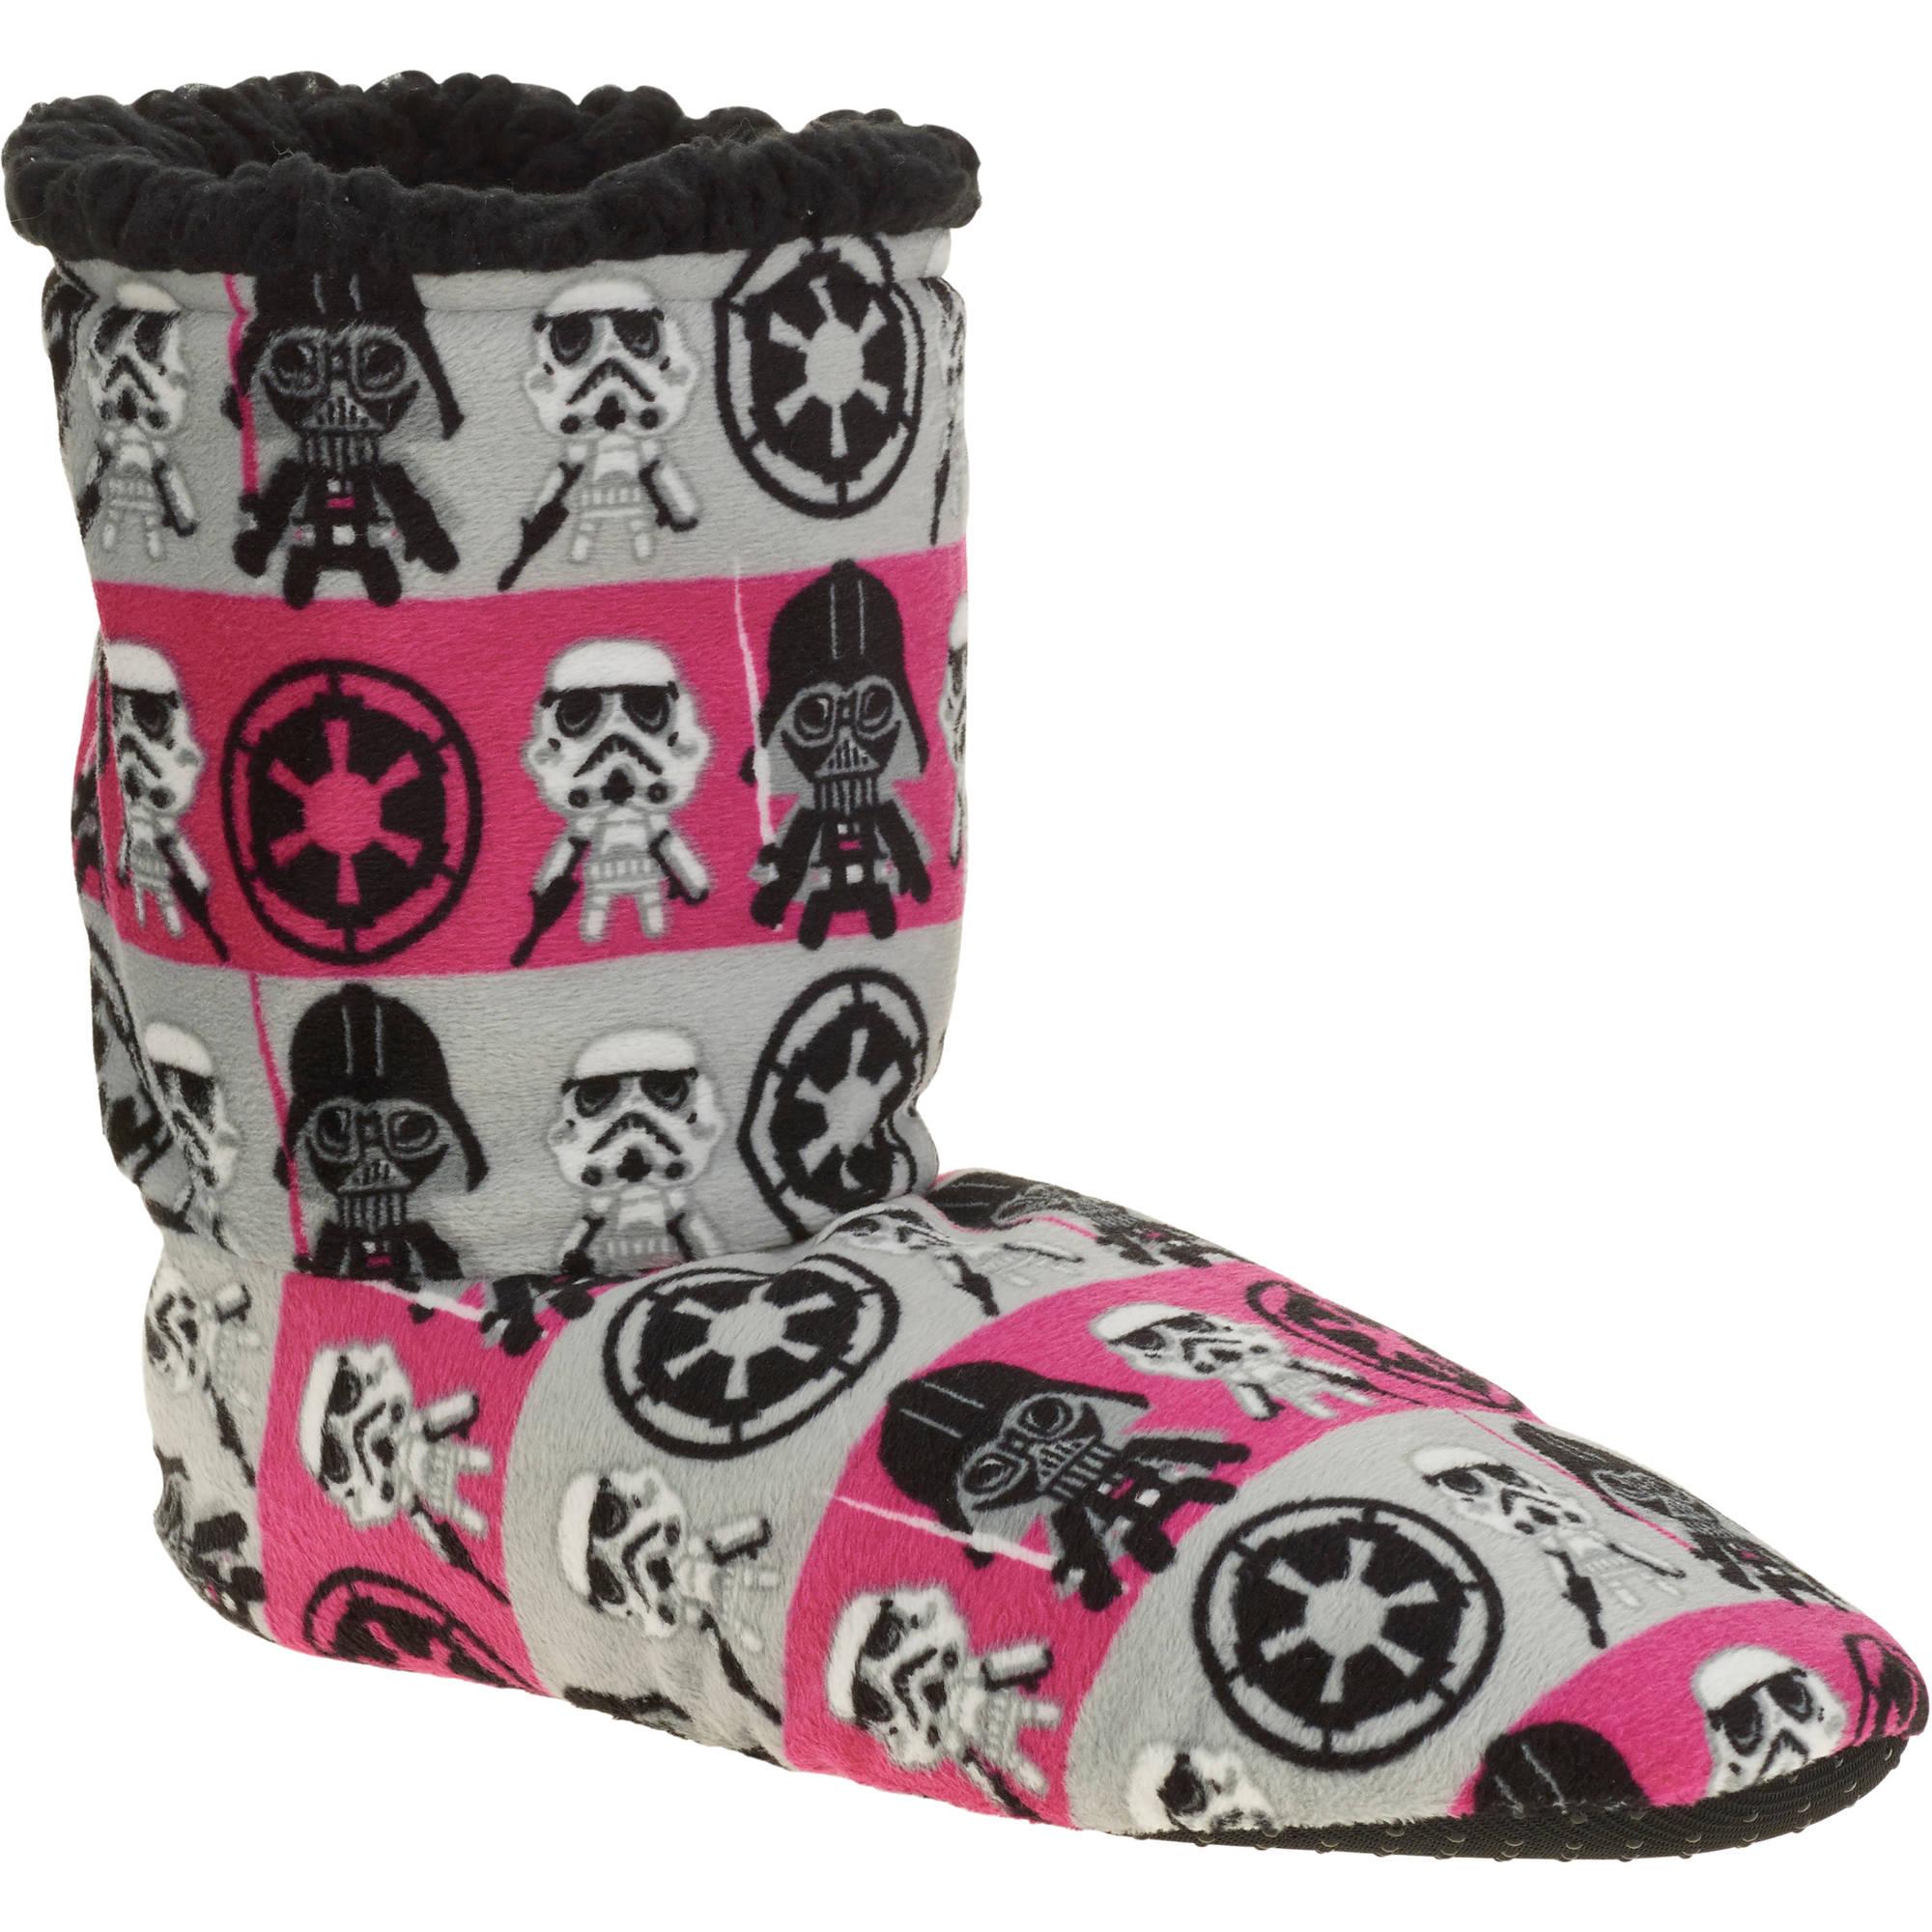 Silky Suede Fuzzy Babba Star Wars Printed Bootie Slipper Socks